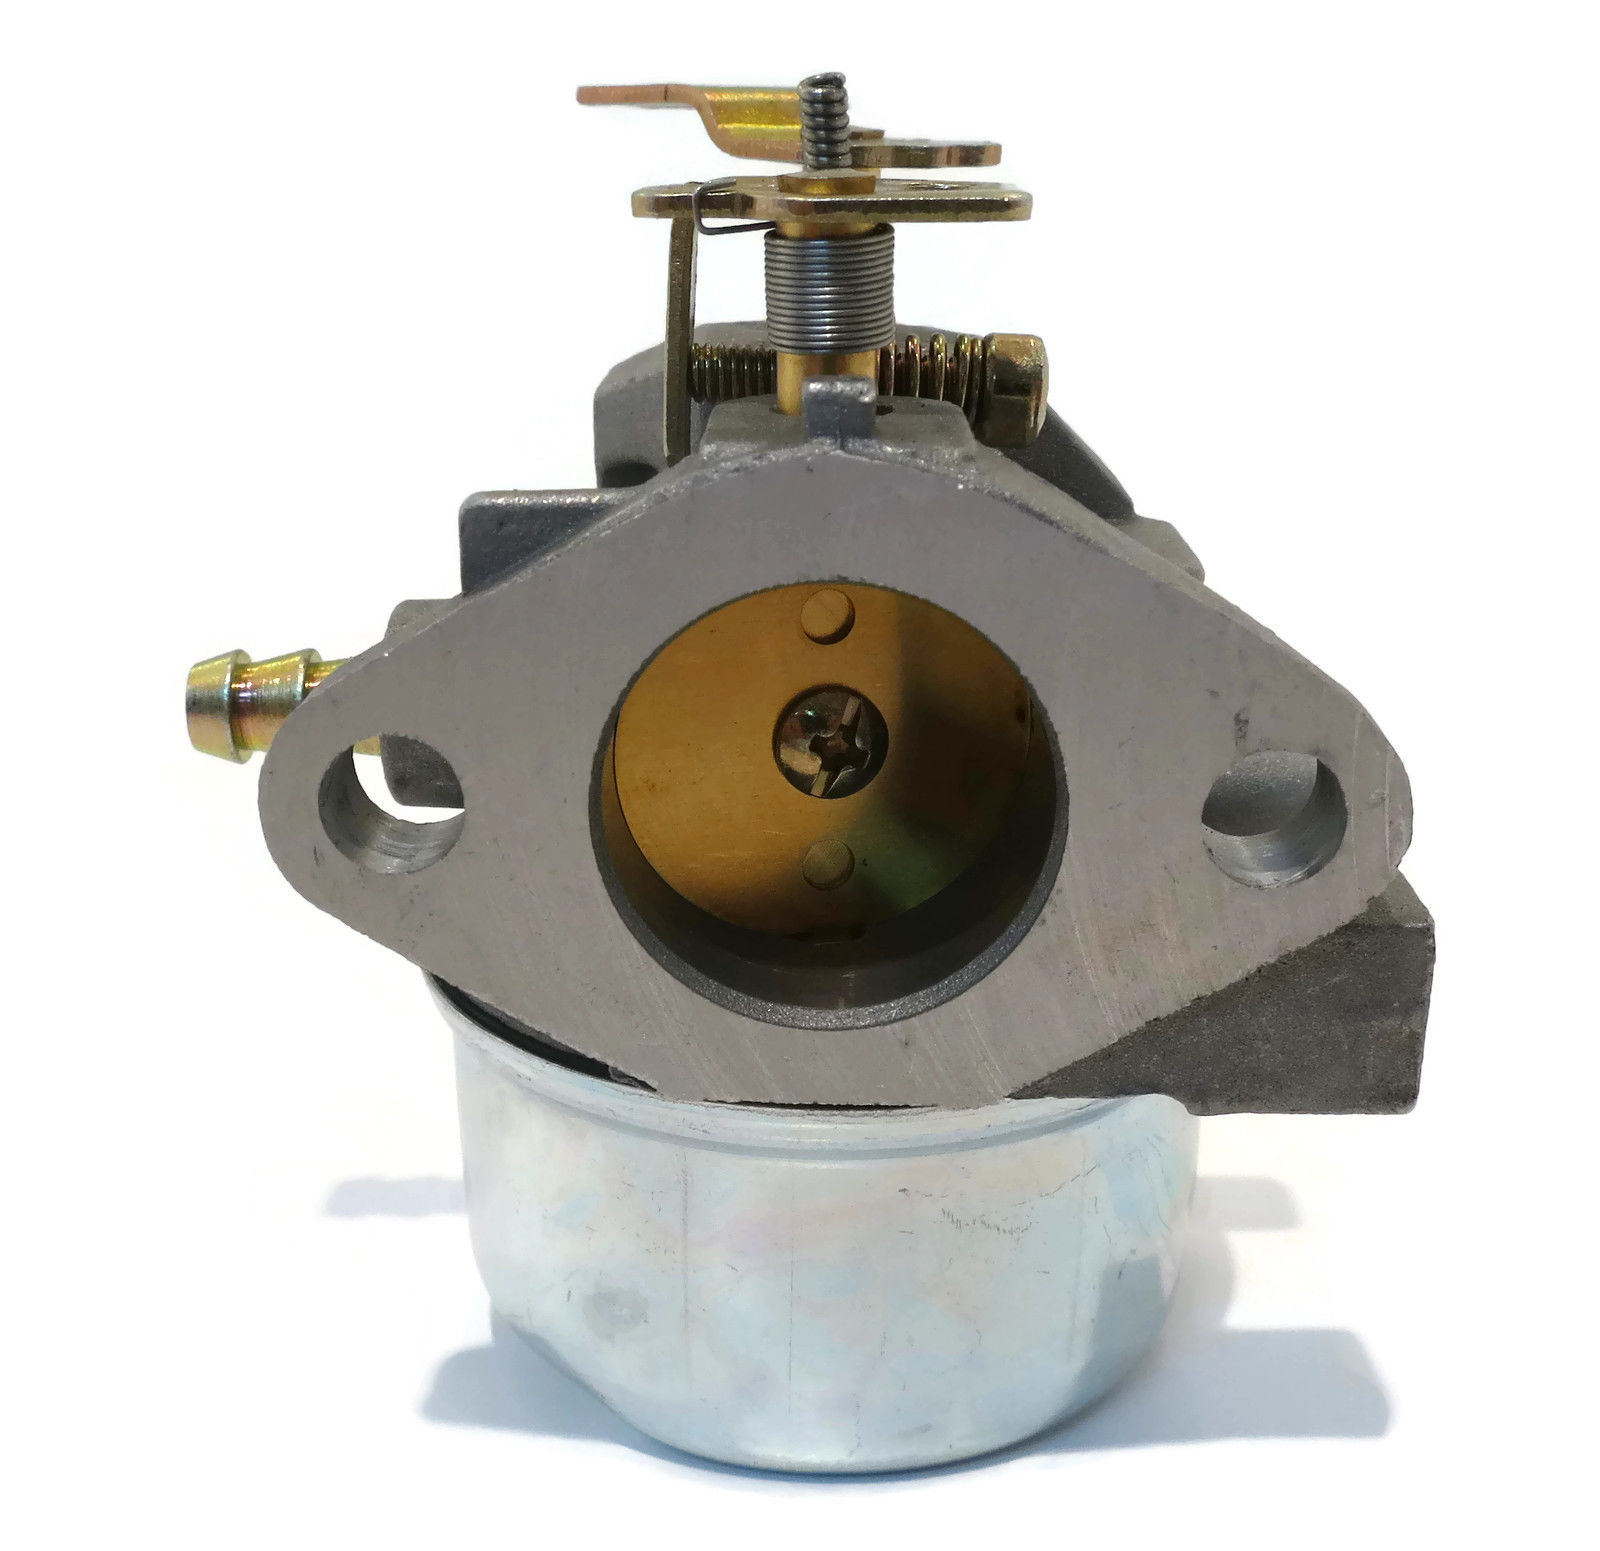 medium resolution of carburetor carb for john deere snow blower thrower trs22 trs24 trs26carburetor carb for john deere snow